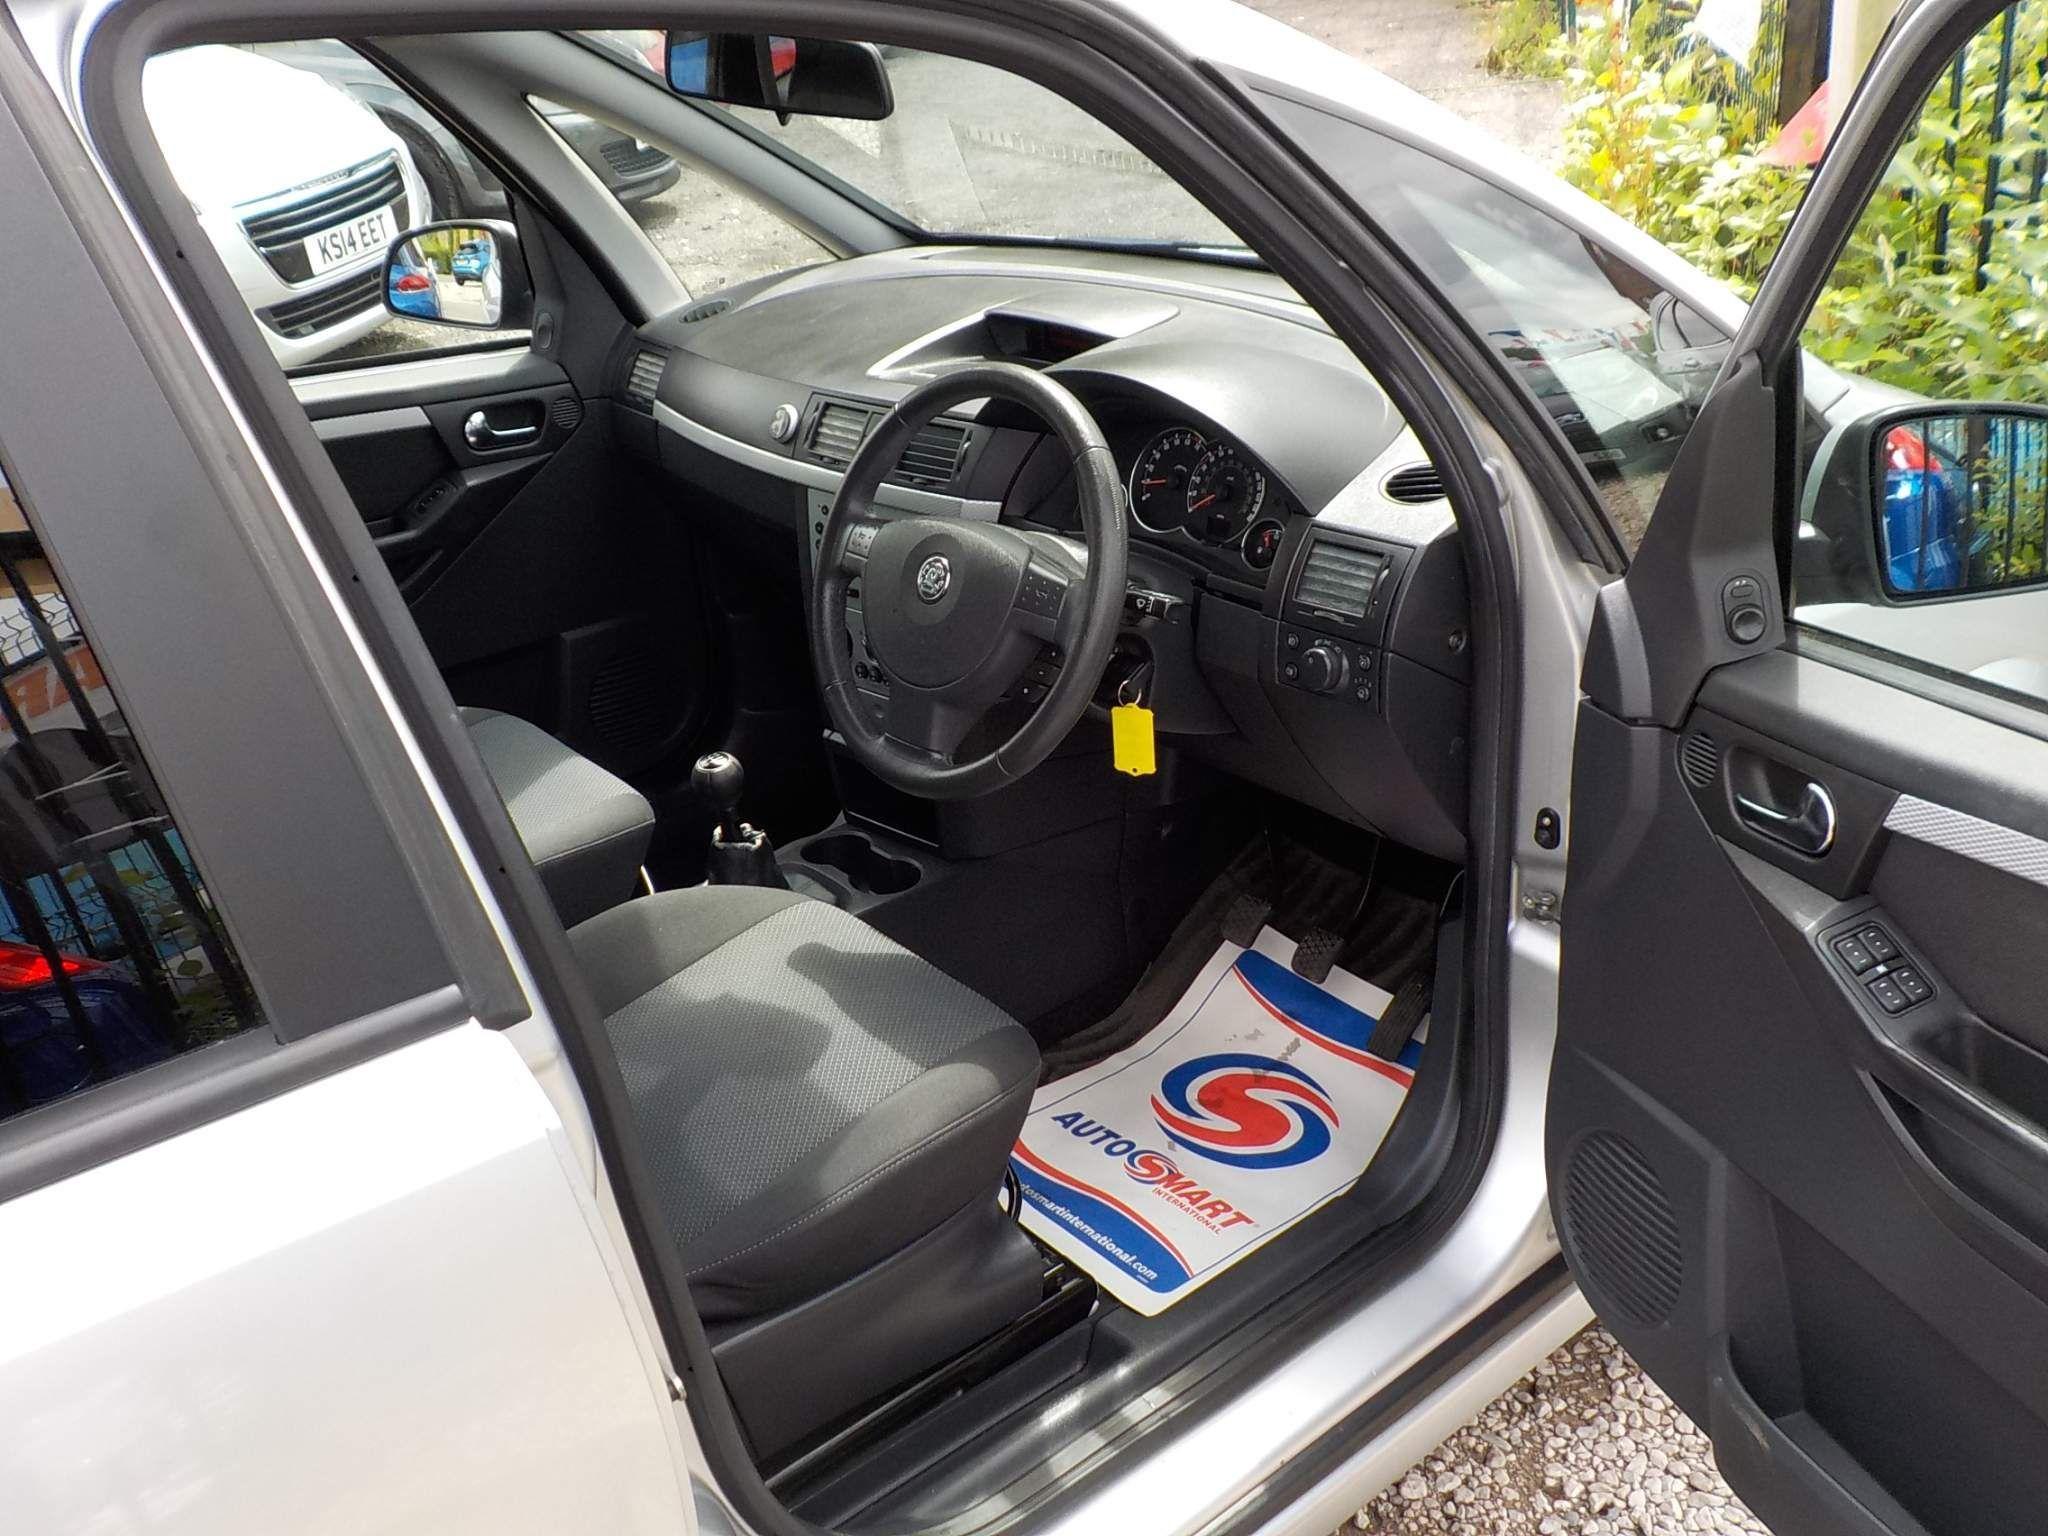 Vauxhall Meriva 1.6 i 16v Design 5dr (a/c)